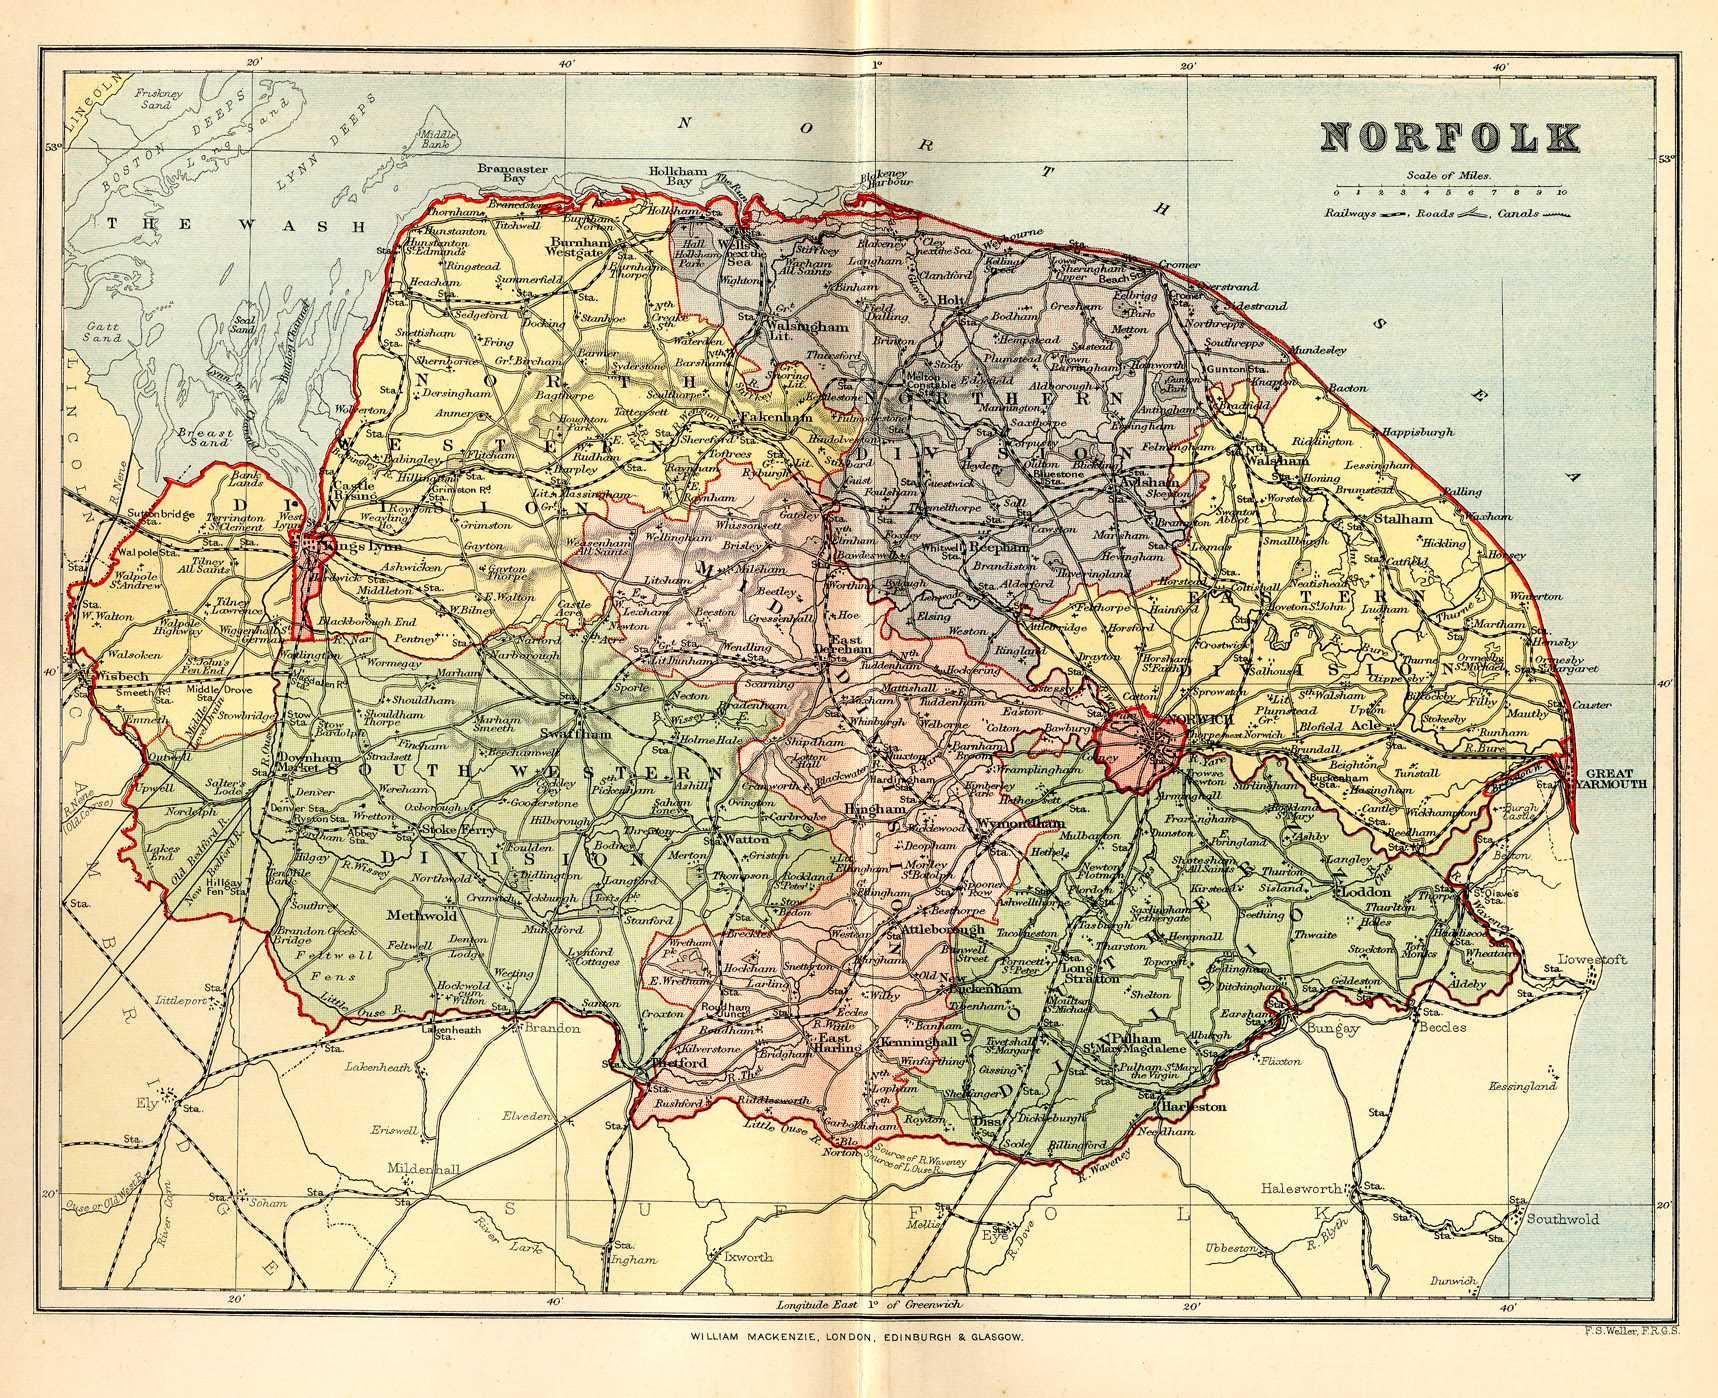 Historical description of Norfolk England